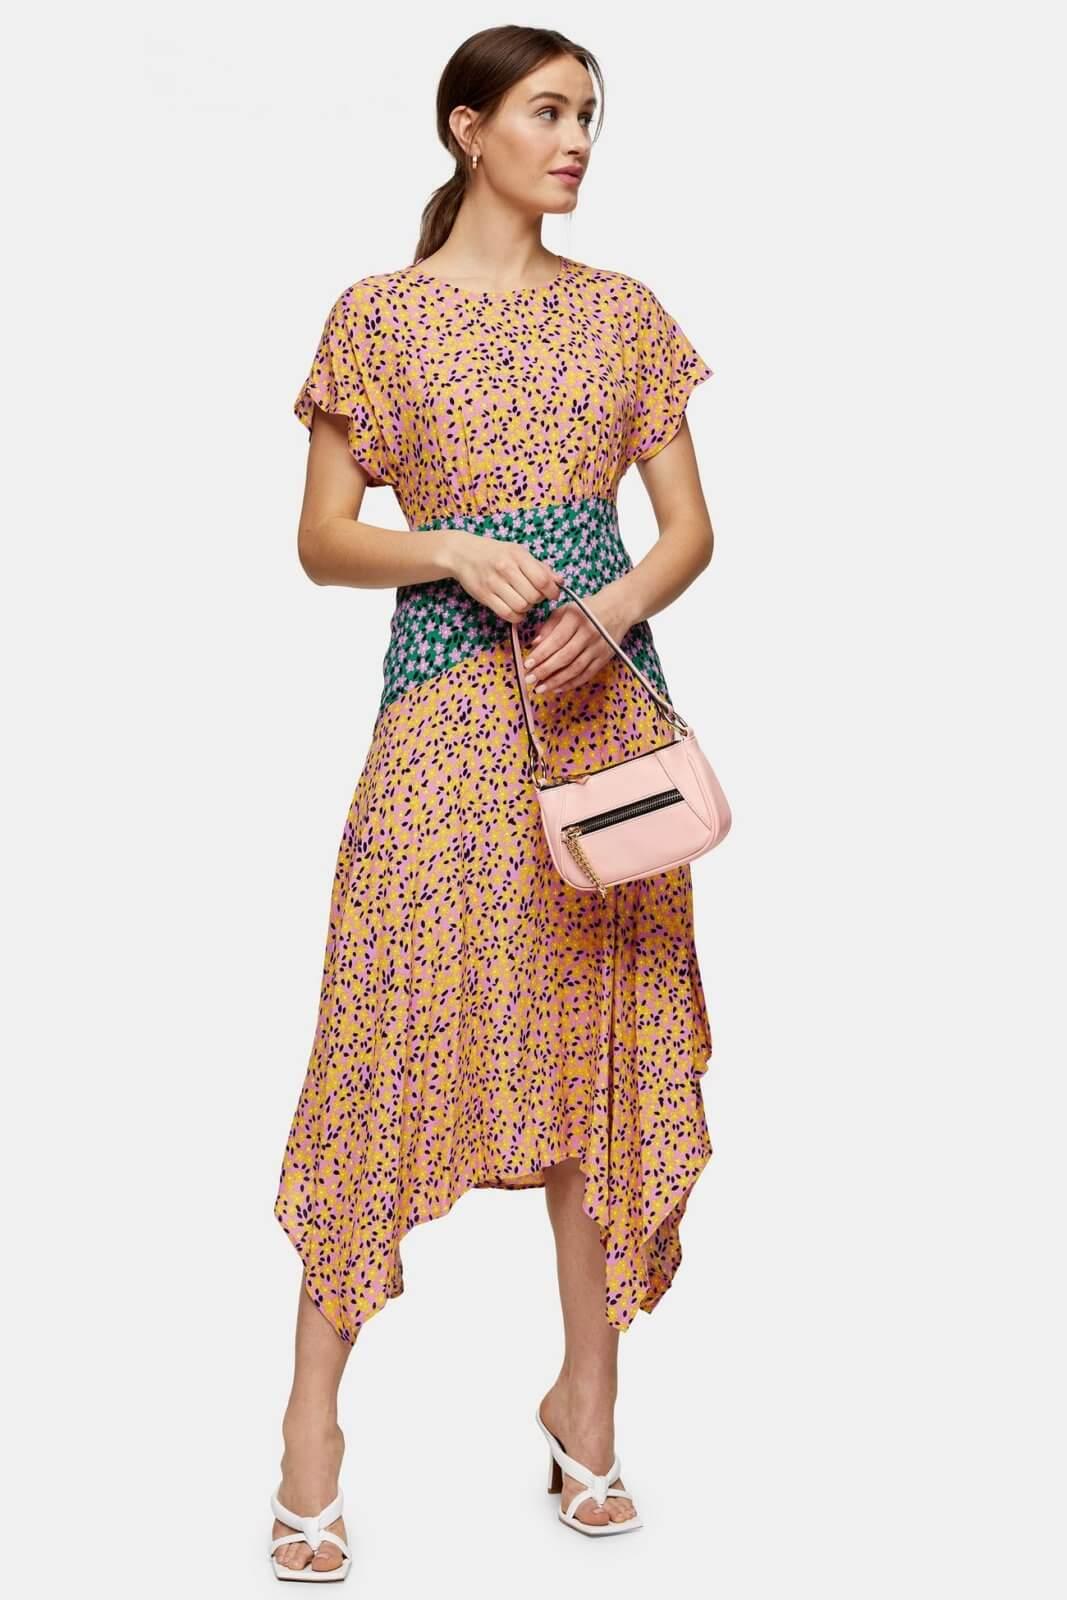 spring essential dress top shop midi dress